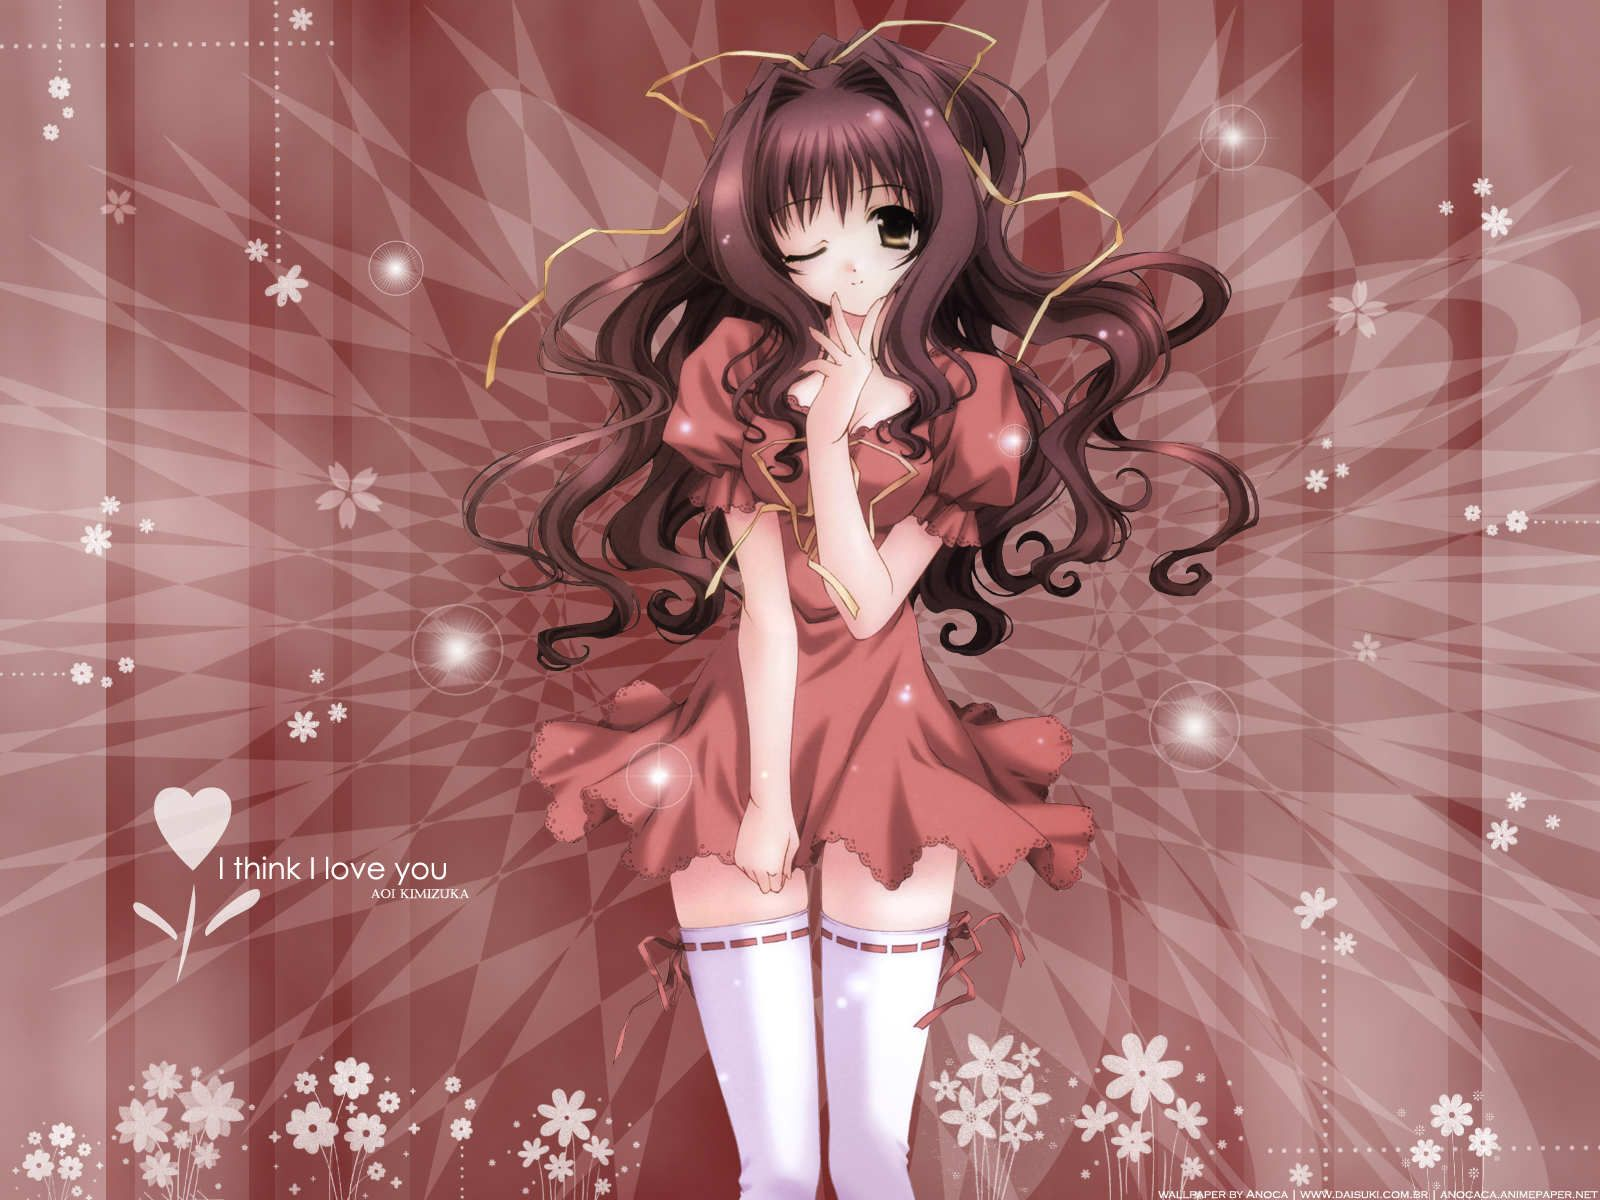 animes  Buscar con Google  images y dibujos  Pinterest  Anime